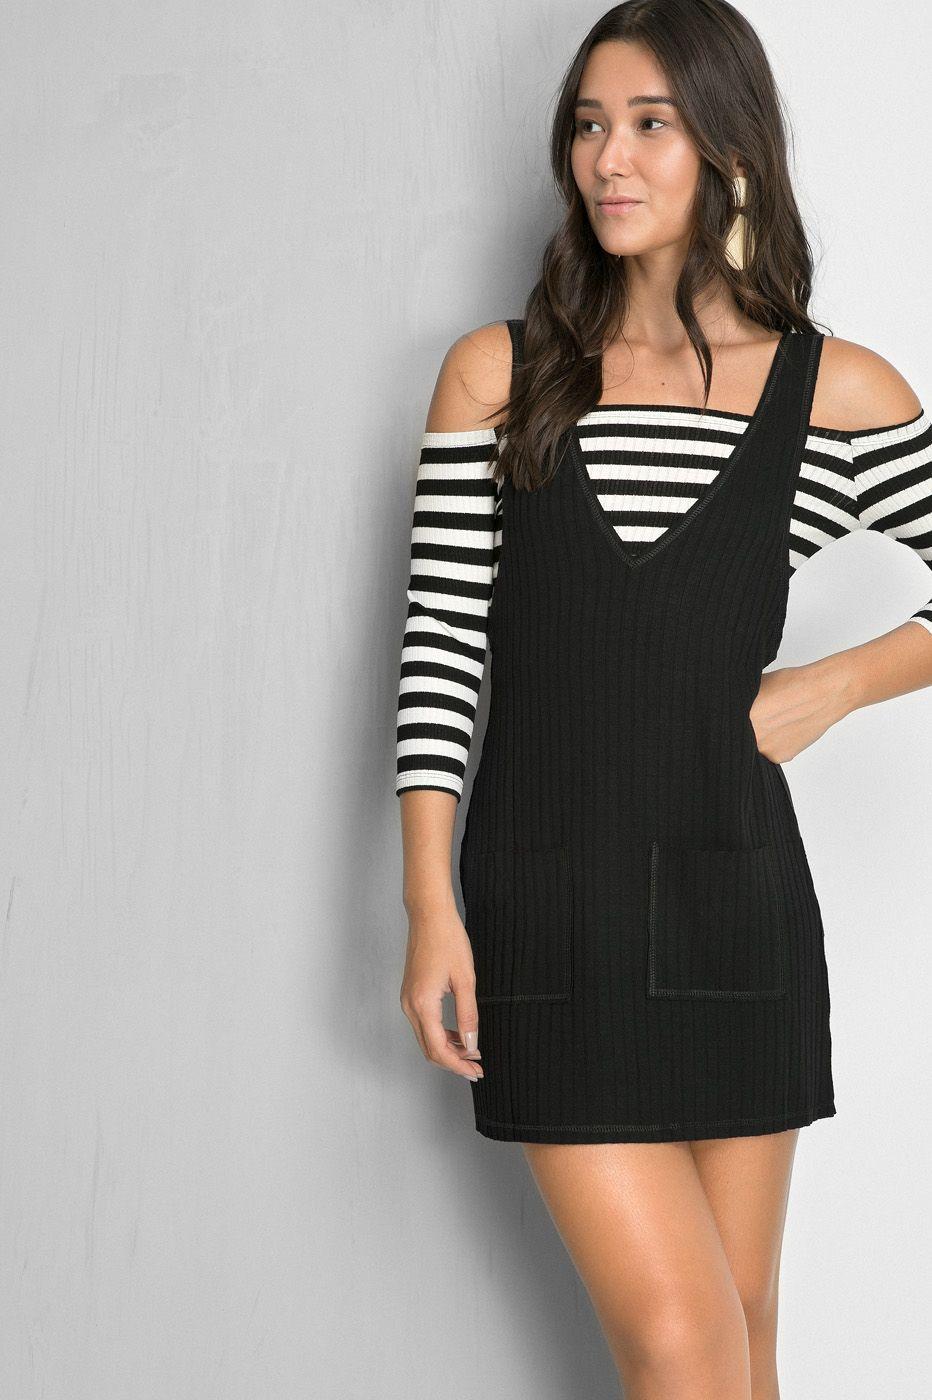 48eab802d053 Dress to Vestido salopete top listrado - Vestidos - Shop | Women's ...